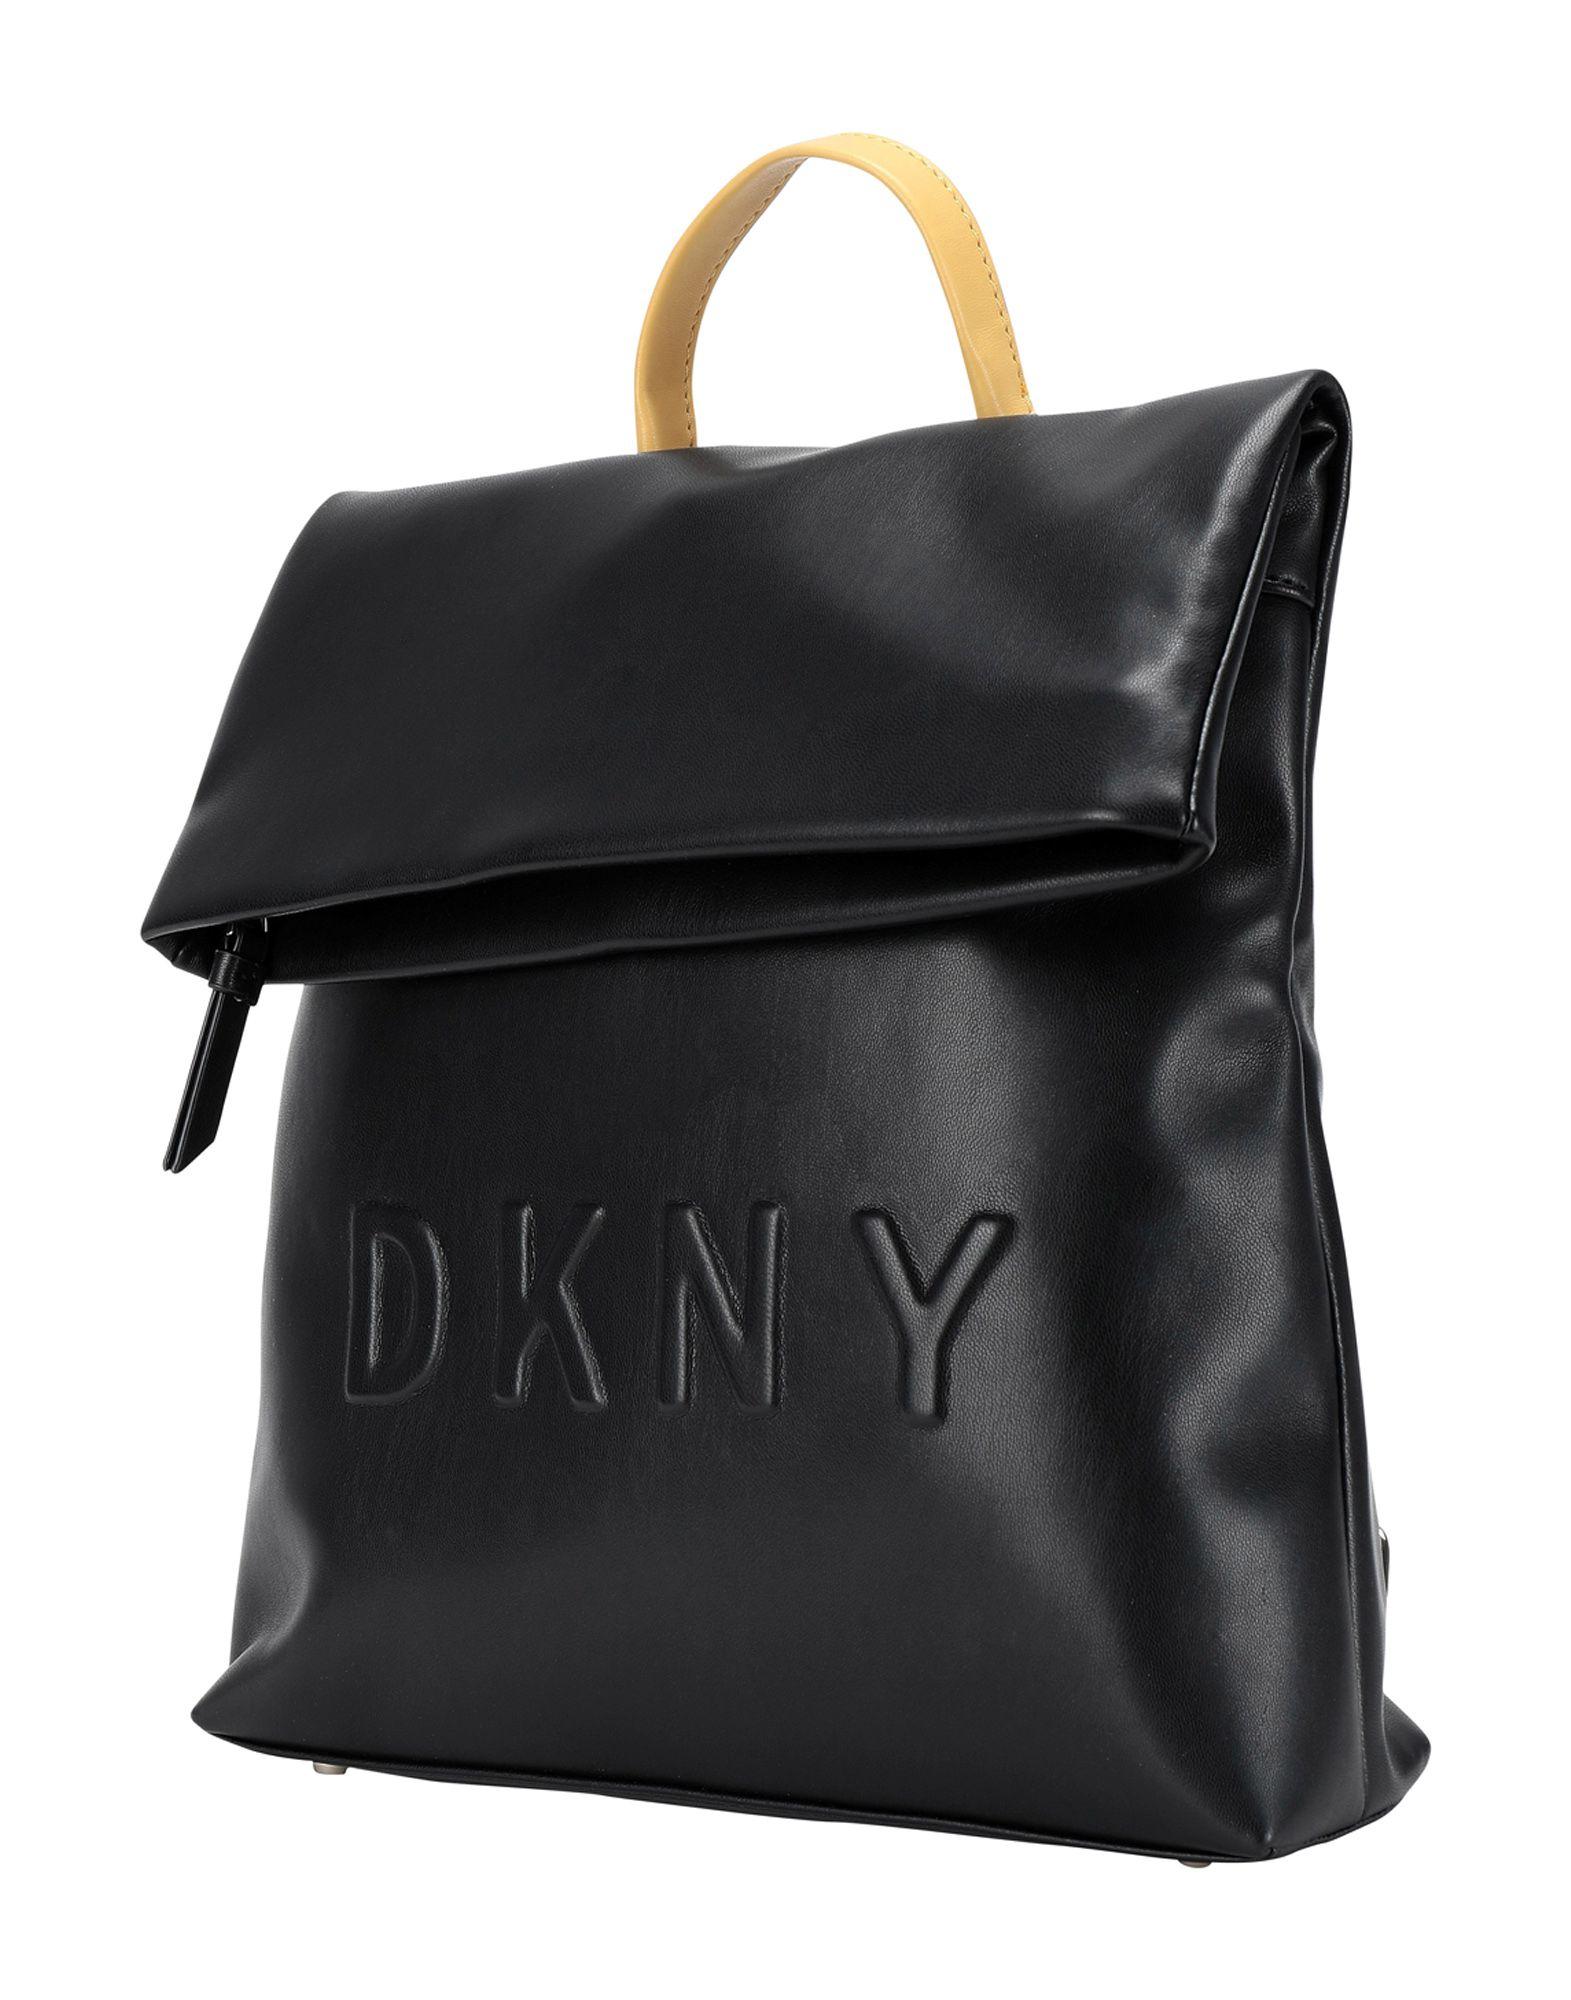 Фото - DKNY Рюкзаки и сумки на пояс обувь на высокой платформе dkny